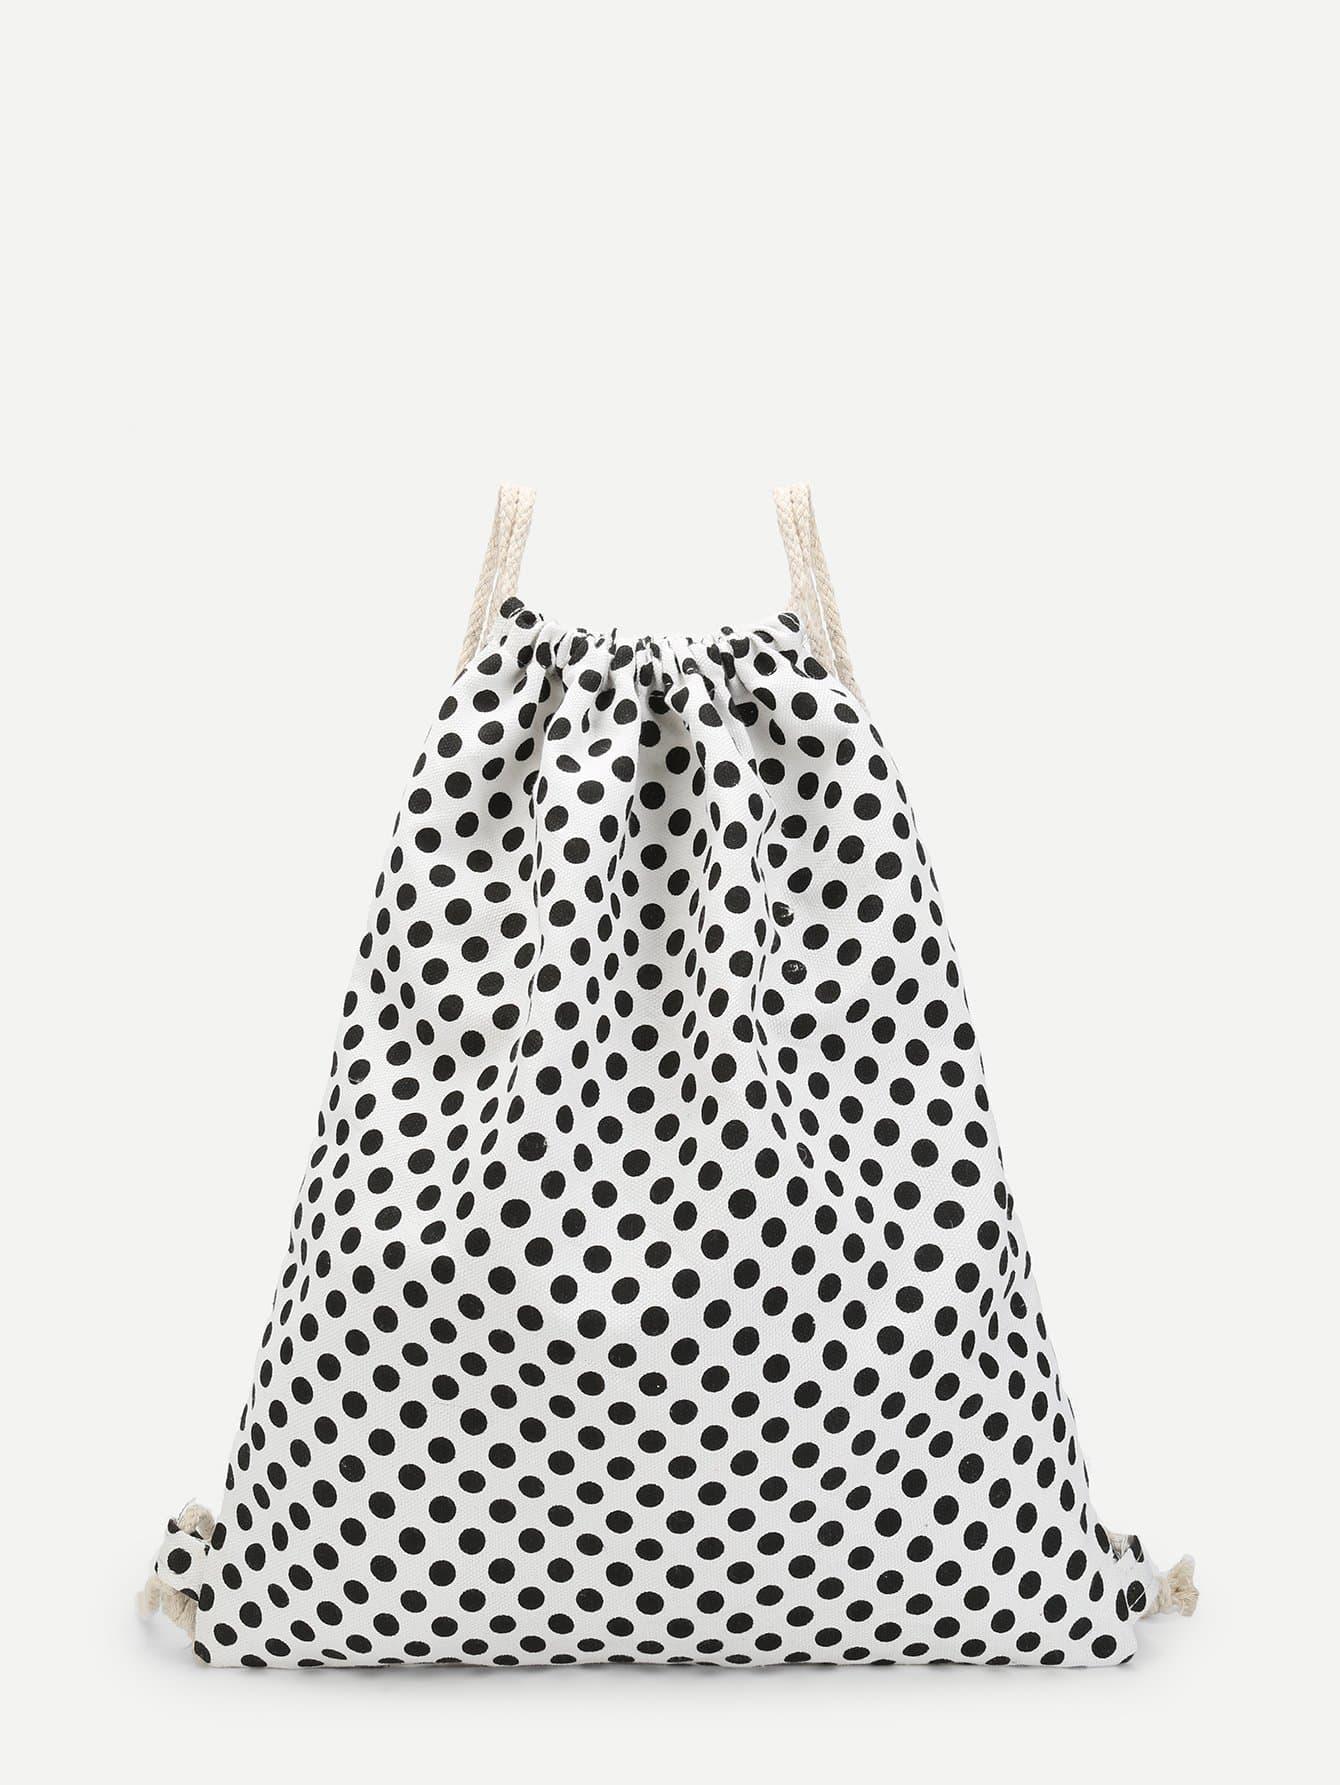 Polka Dot Print Drawstring Backpack polka dot backpack